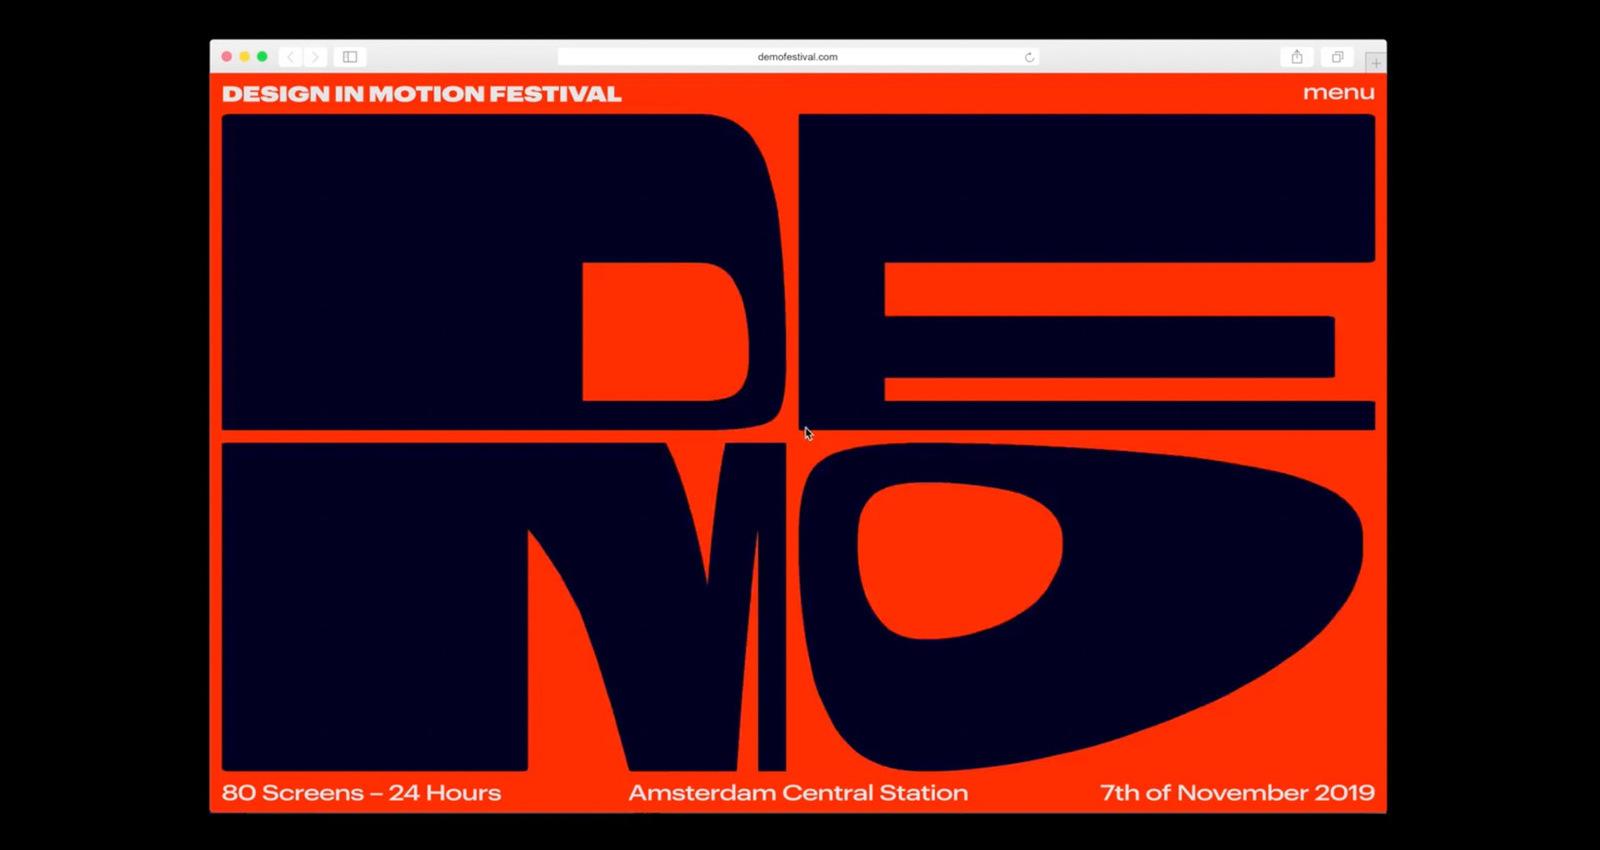 DEMO - Design in Motion Festival